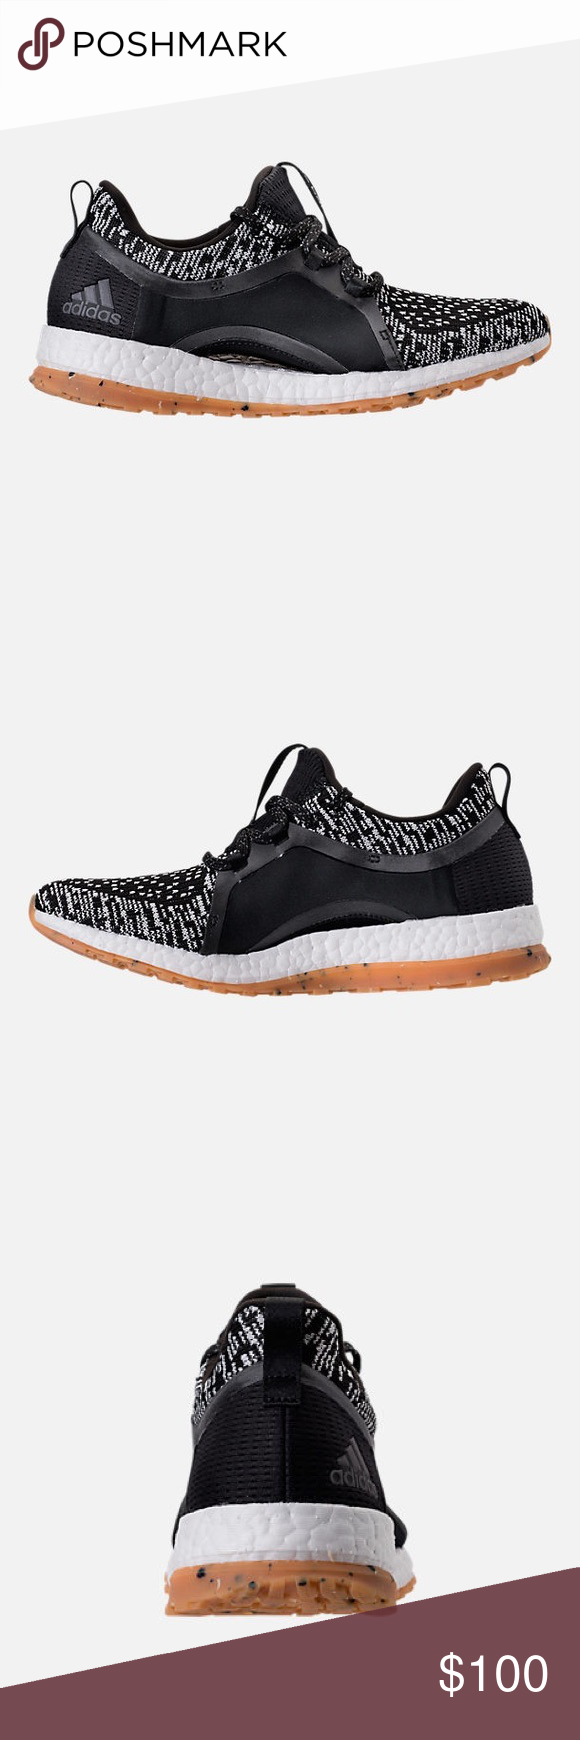 Adidas pureboost XPOSE ATR corriendo zapatos Pinterest corriendo zapatos